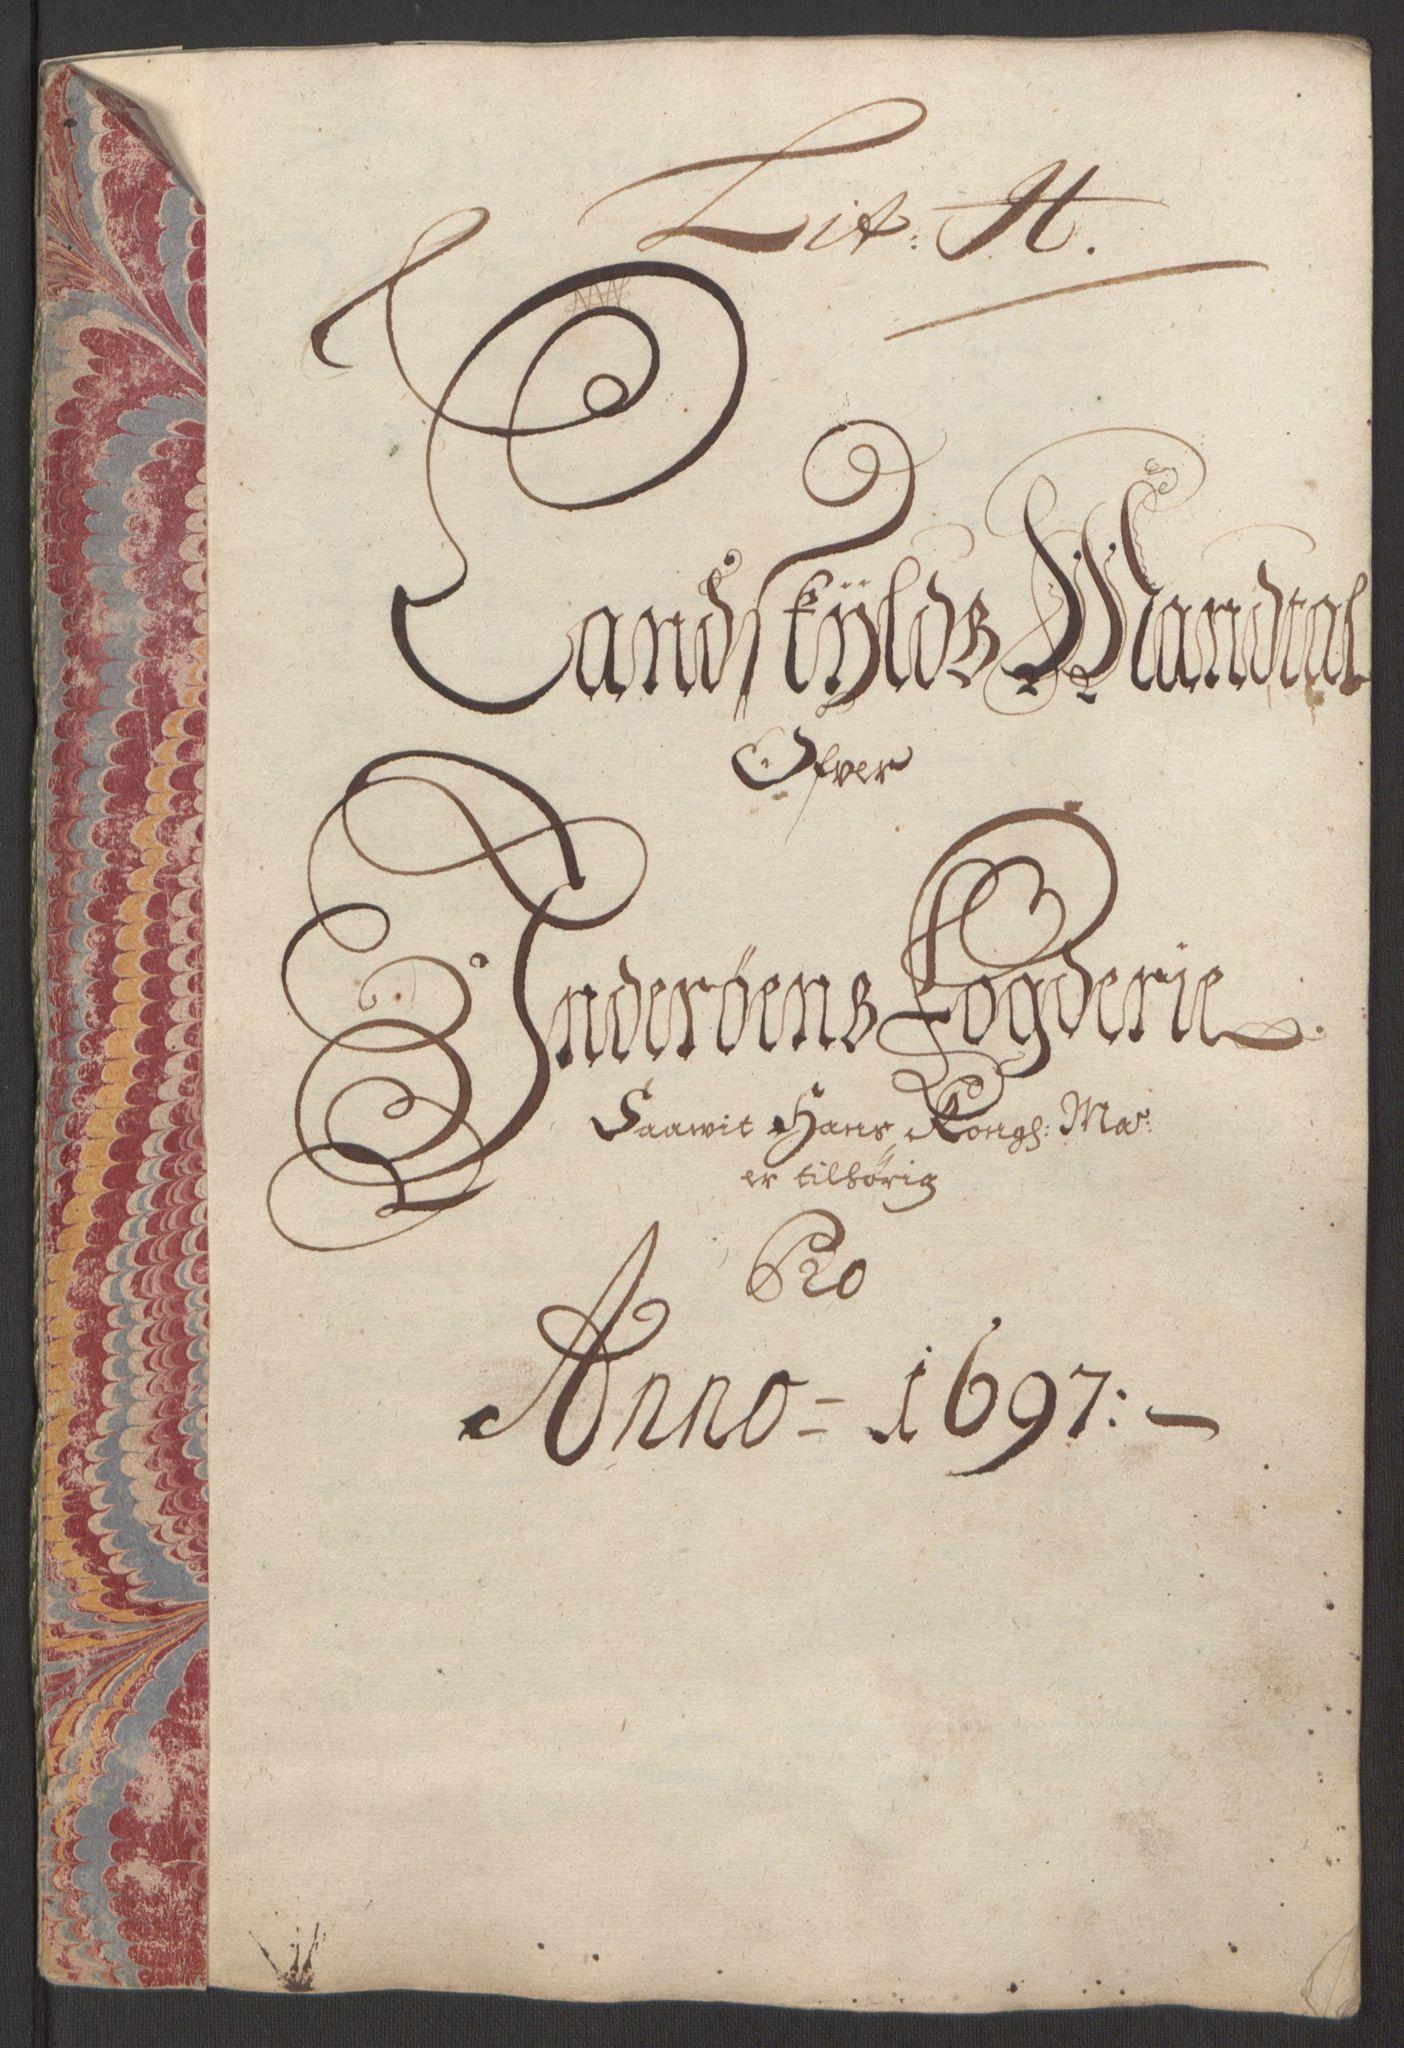 RA, Rentekammeret inntil 1814, Reviderte regnskaper, Fogderegnskap, R63/L4309: Fogderegnskap Inderøy, 1695-1697, s. 460